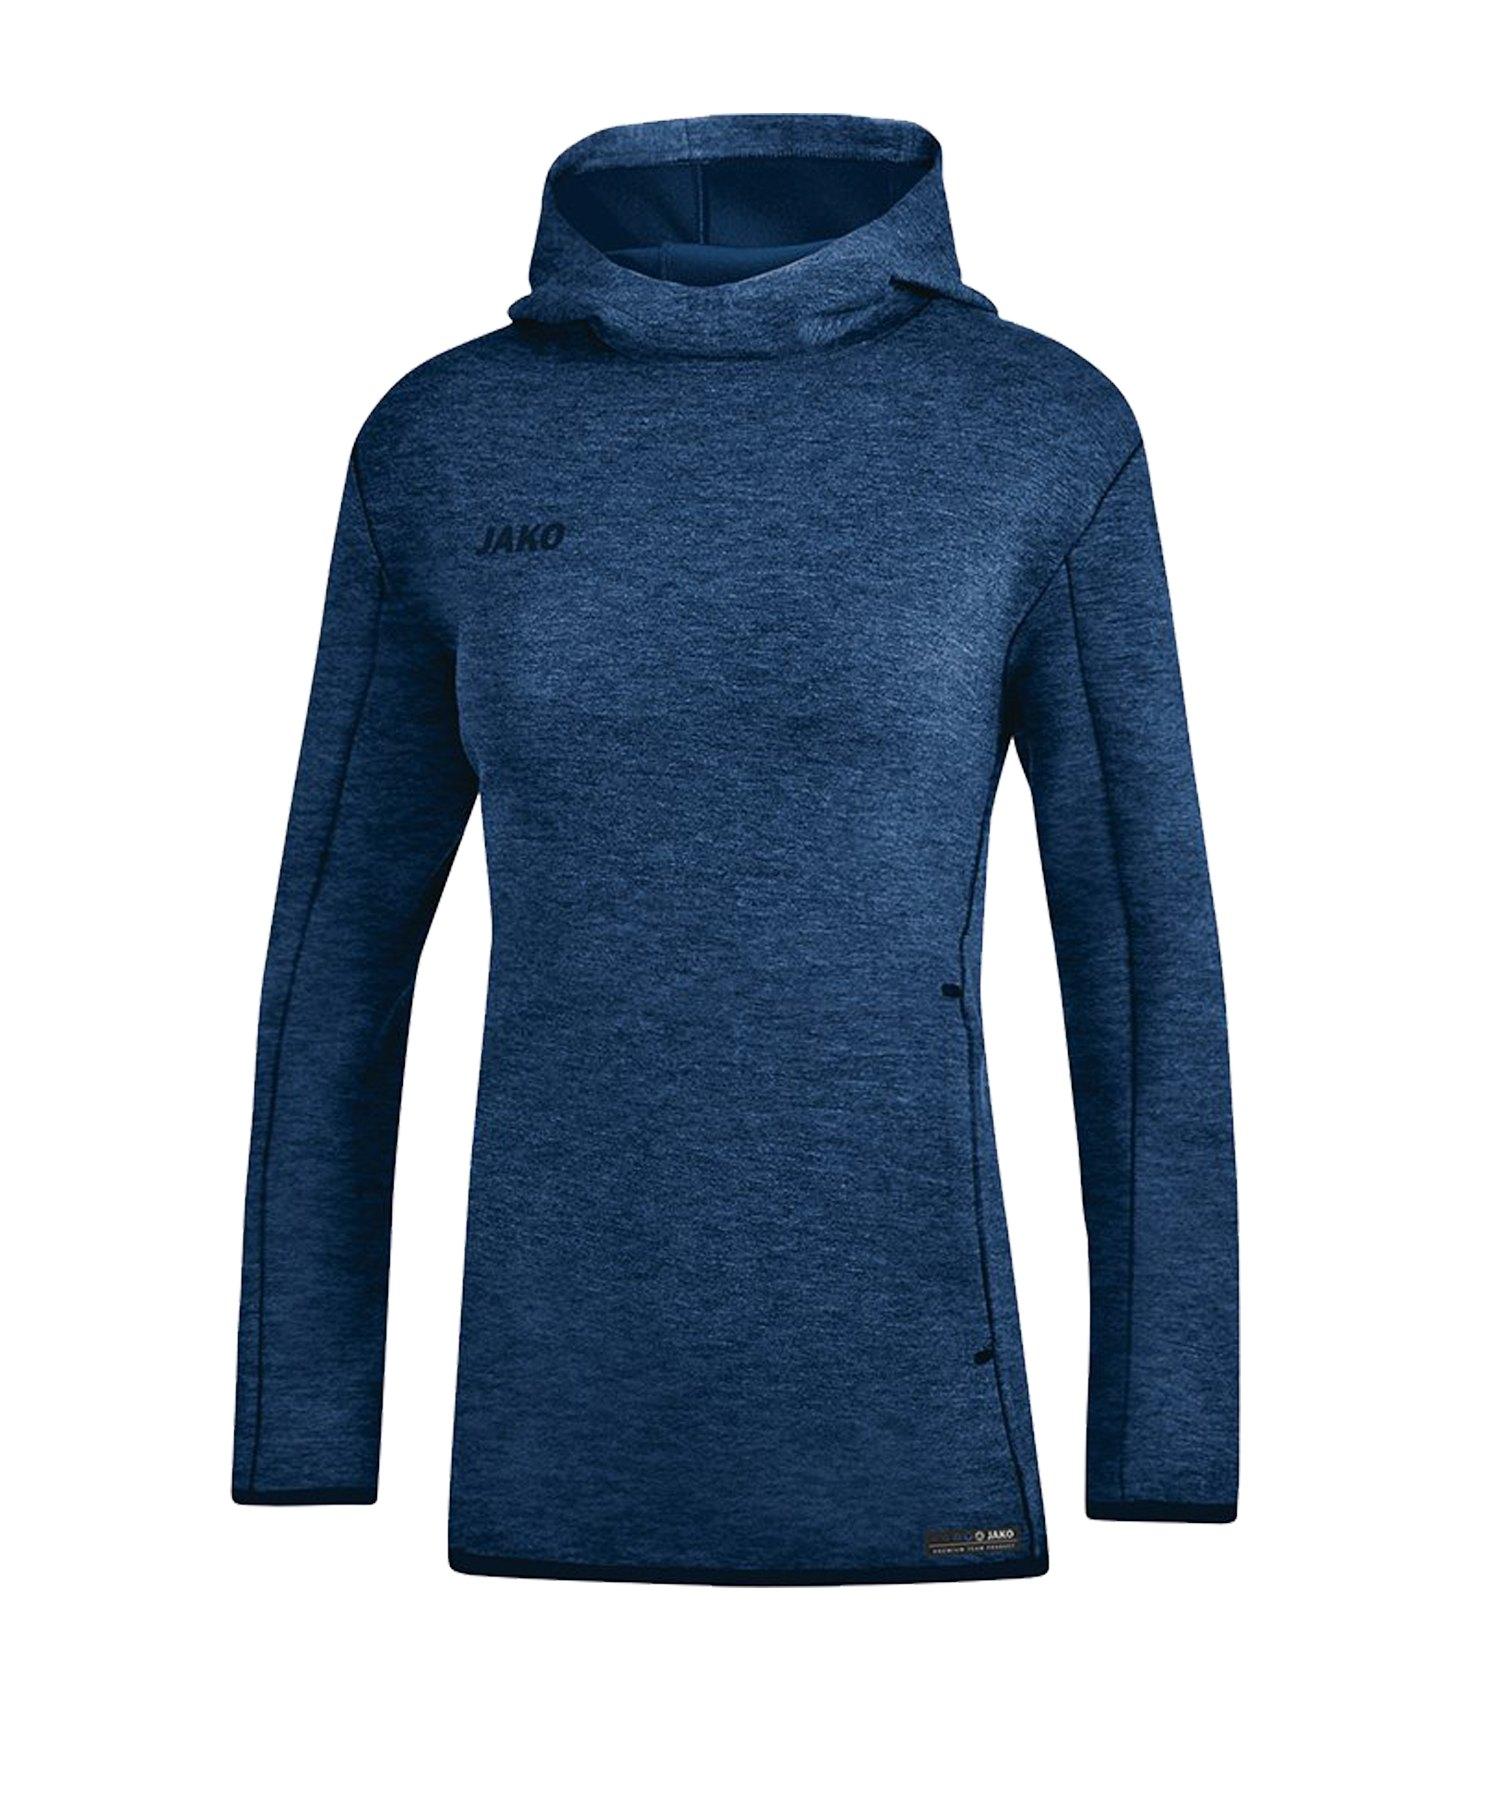 Jako Premium Basic Hoody Damen Blau F49 - blau